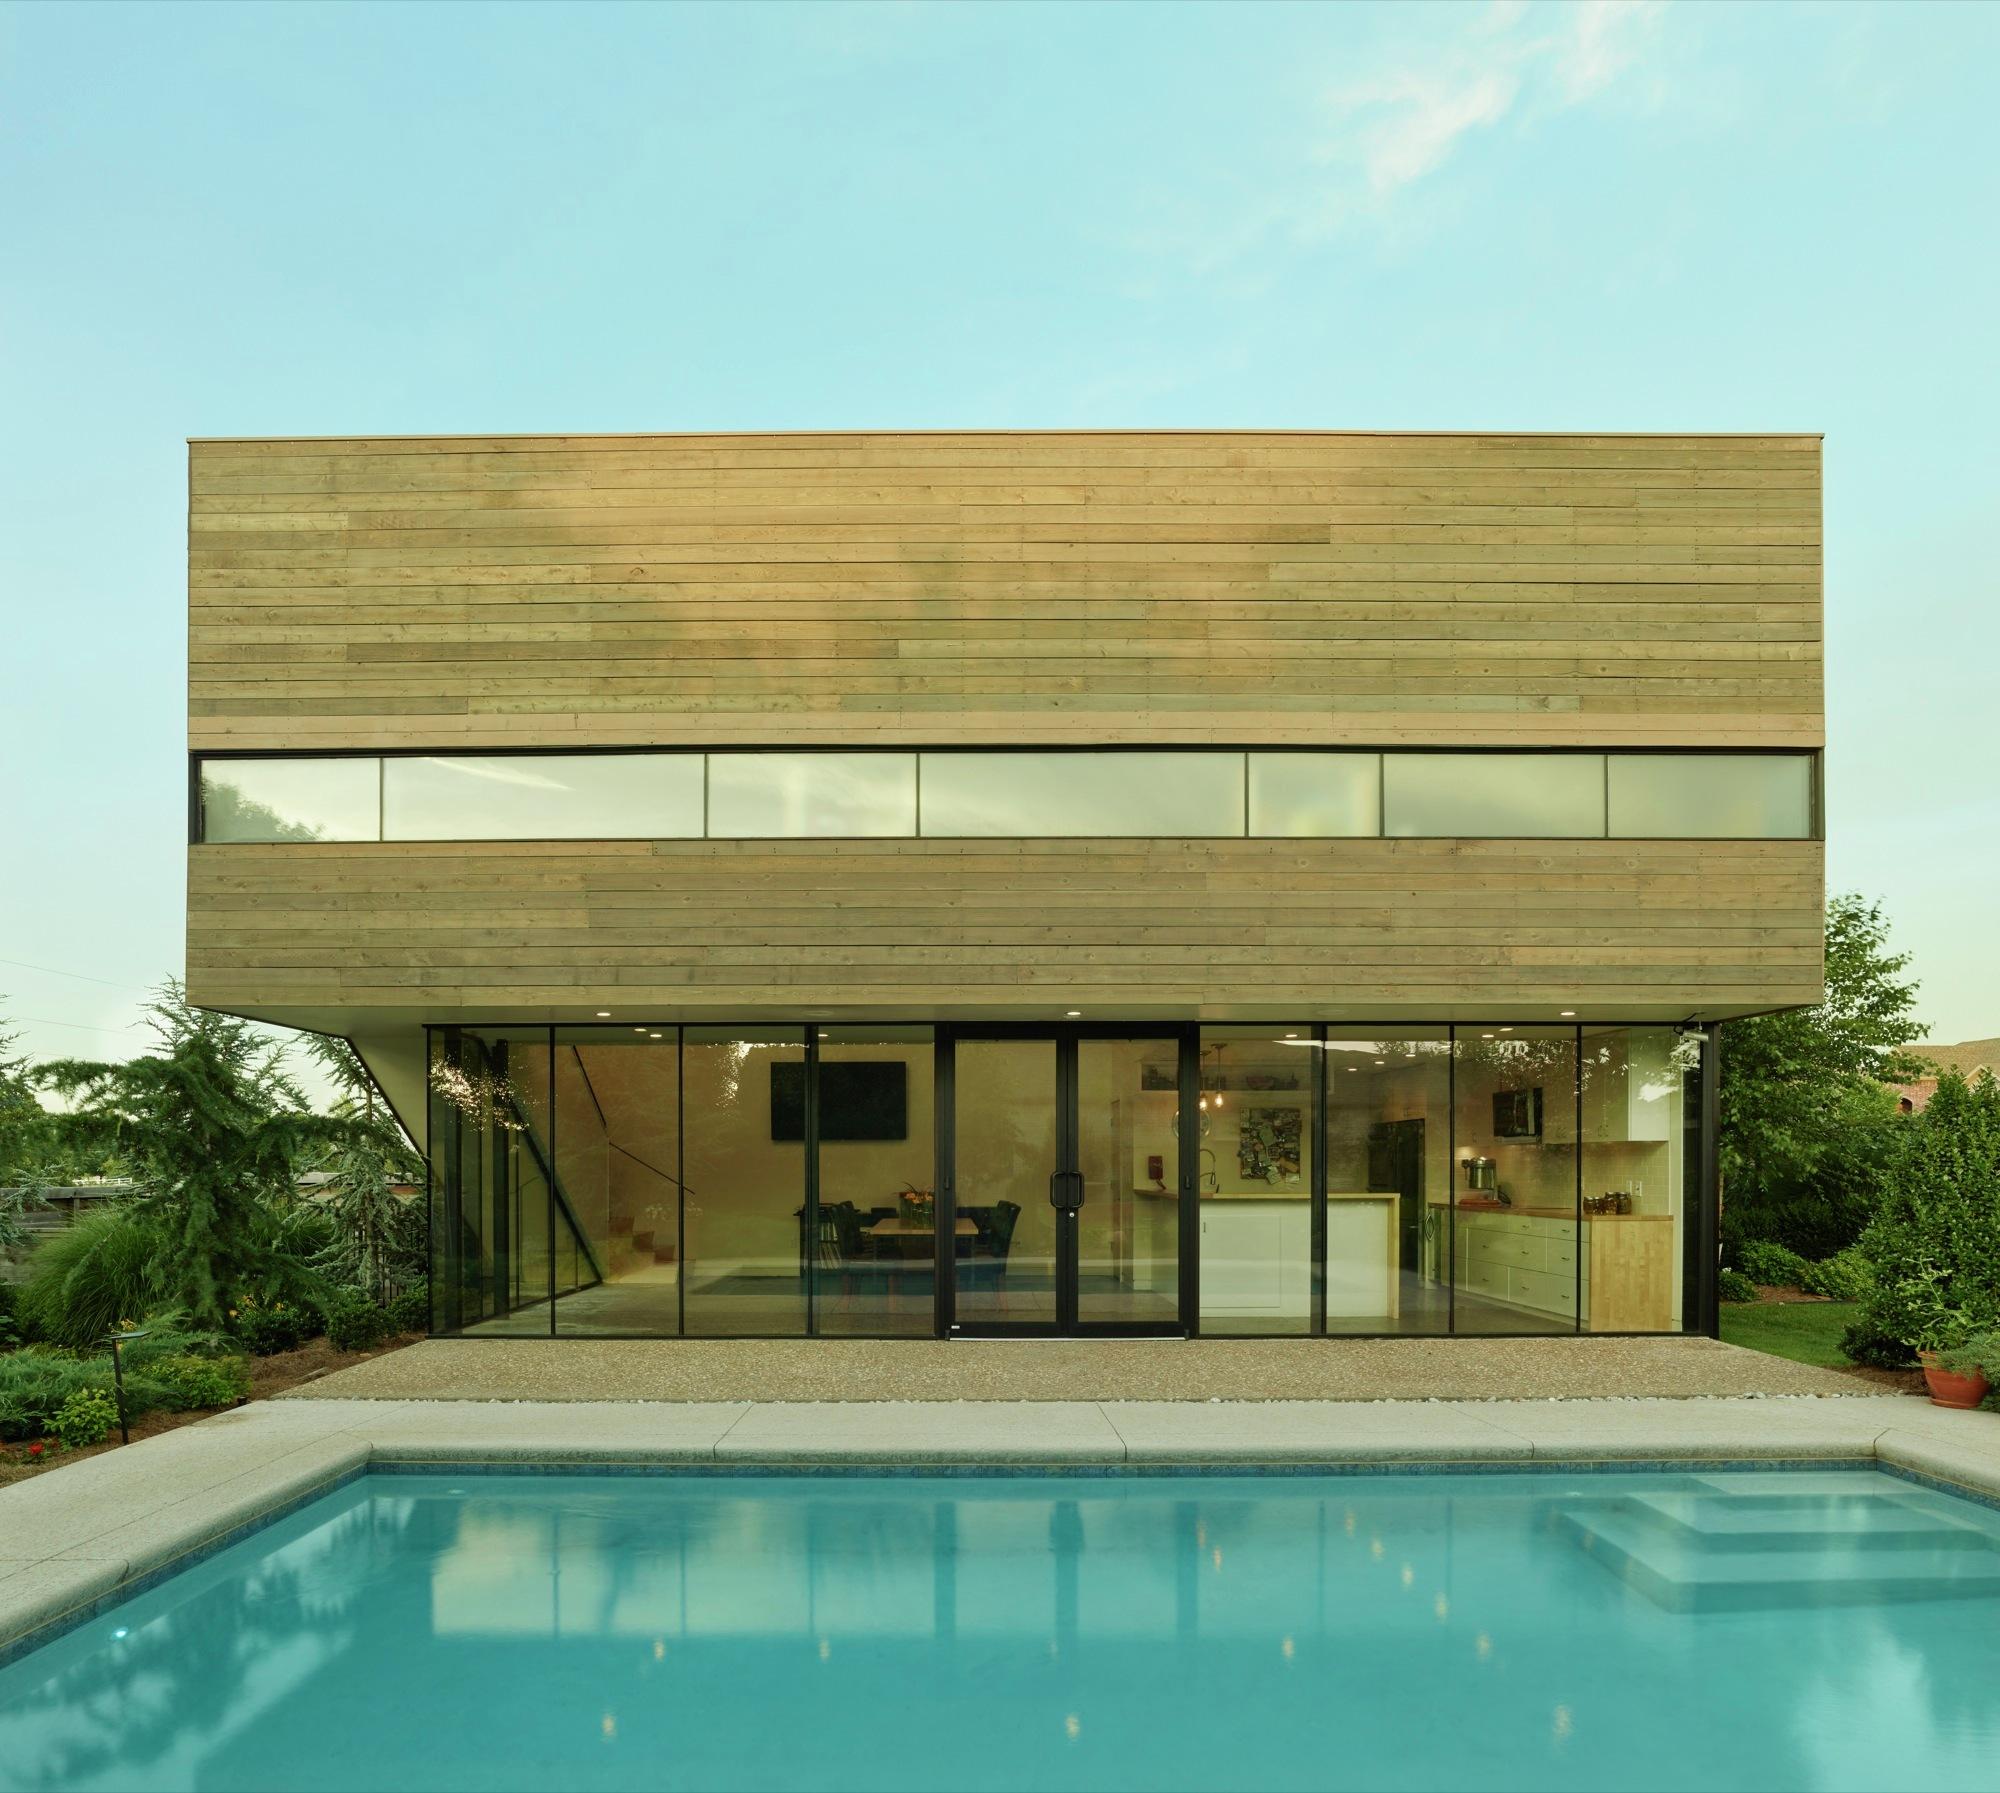 Gallery Of Srygley Pool House Marlon Blackwell Architect 2